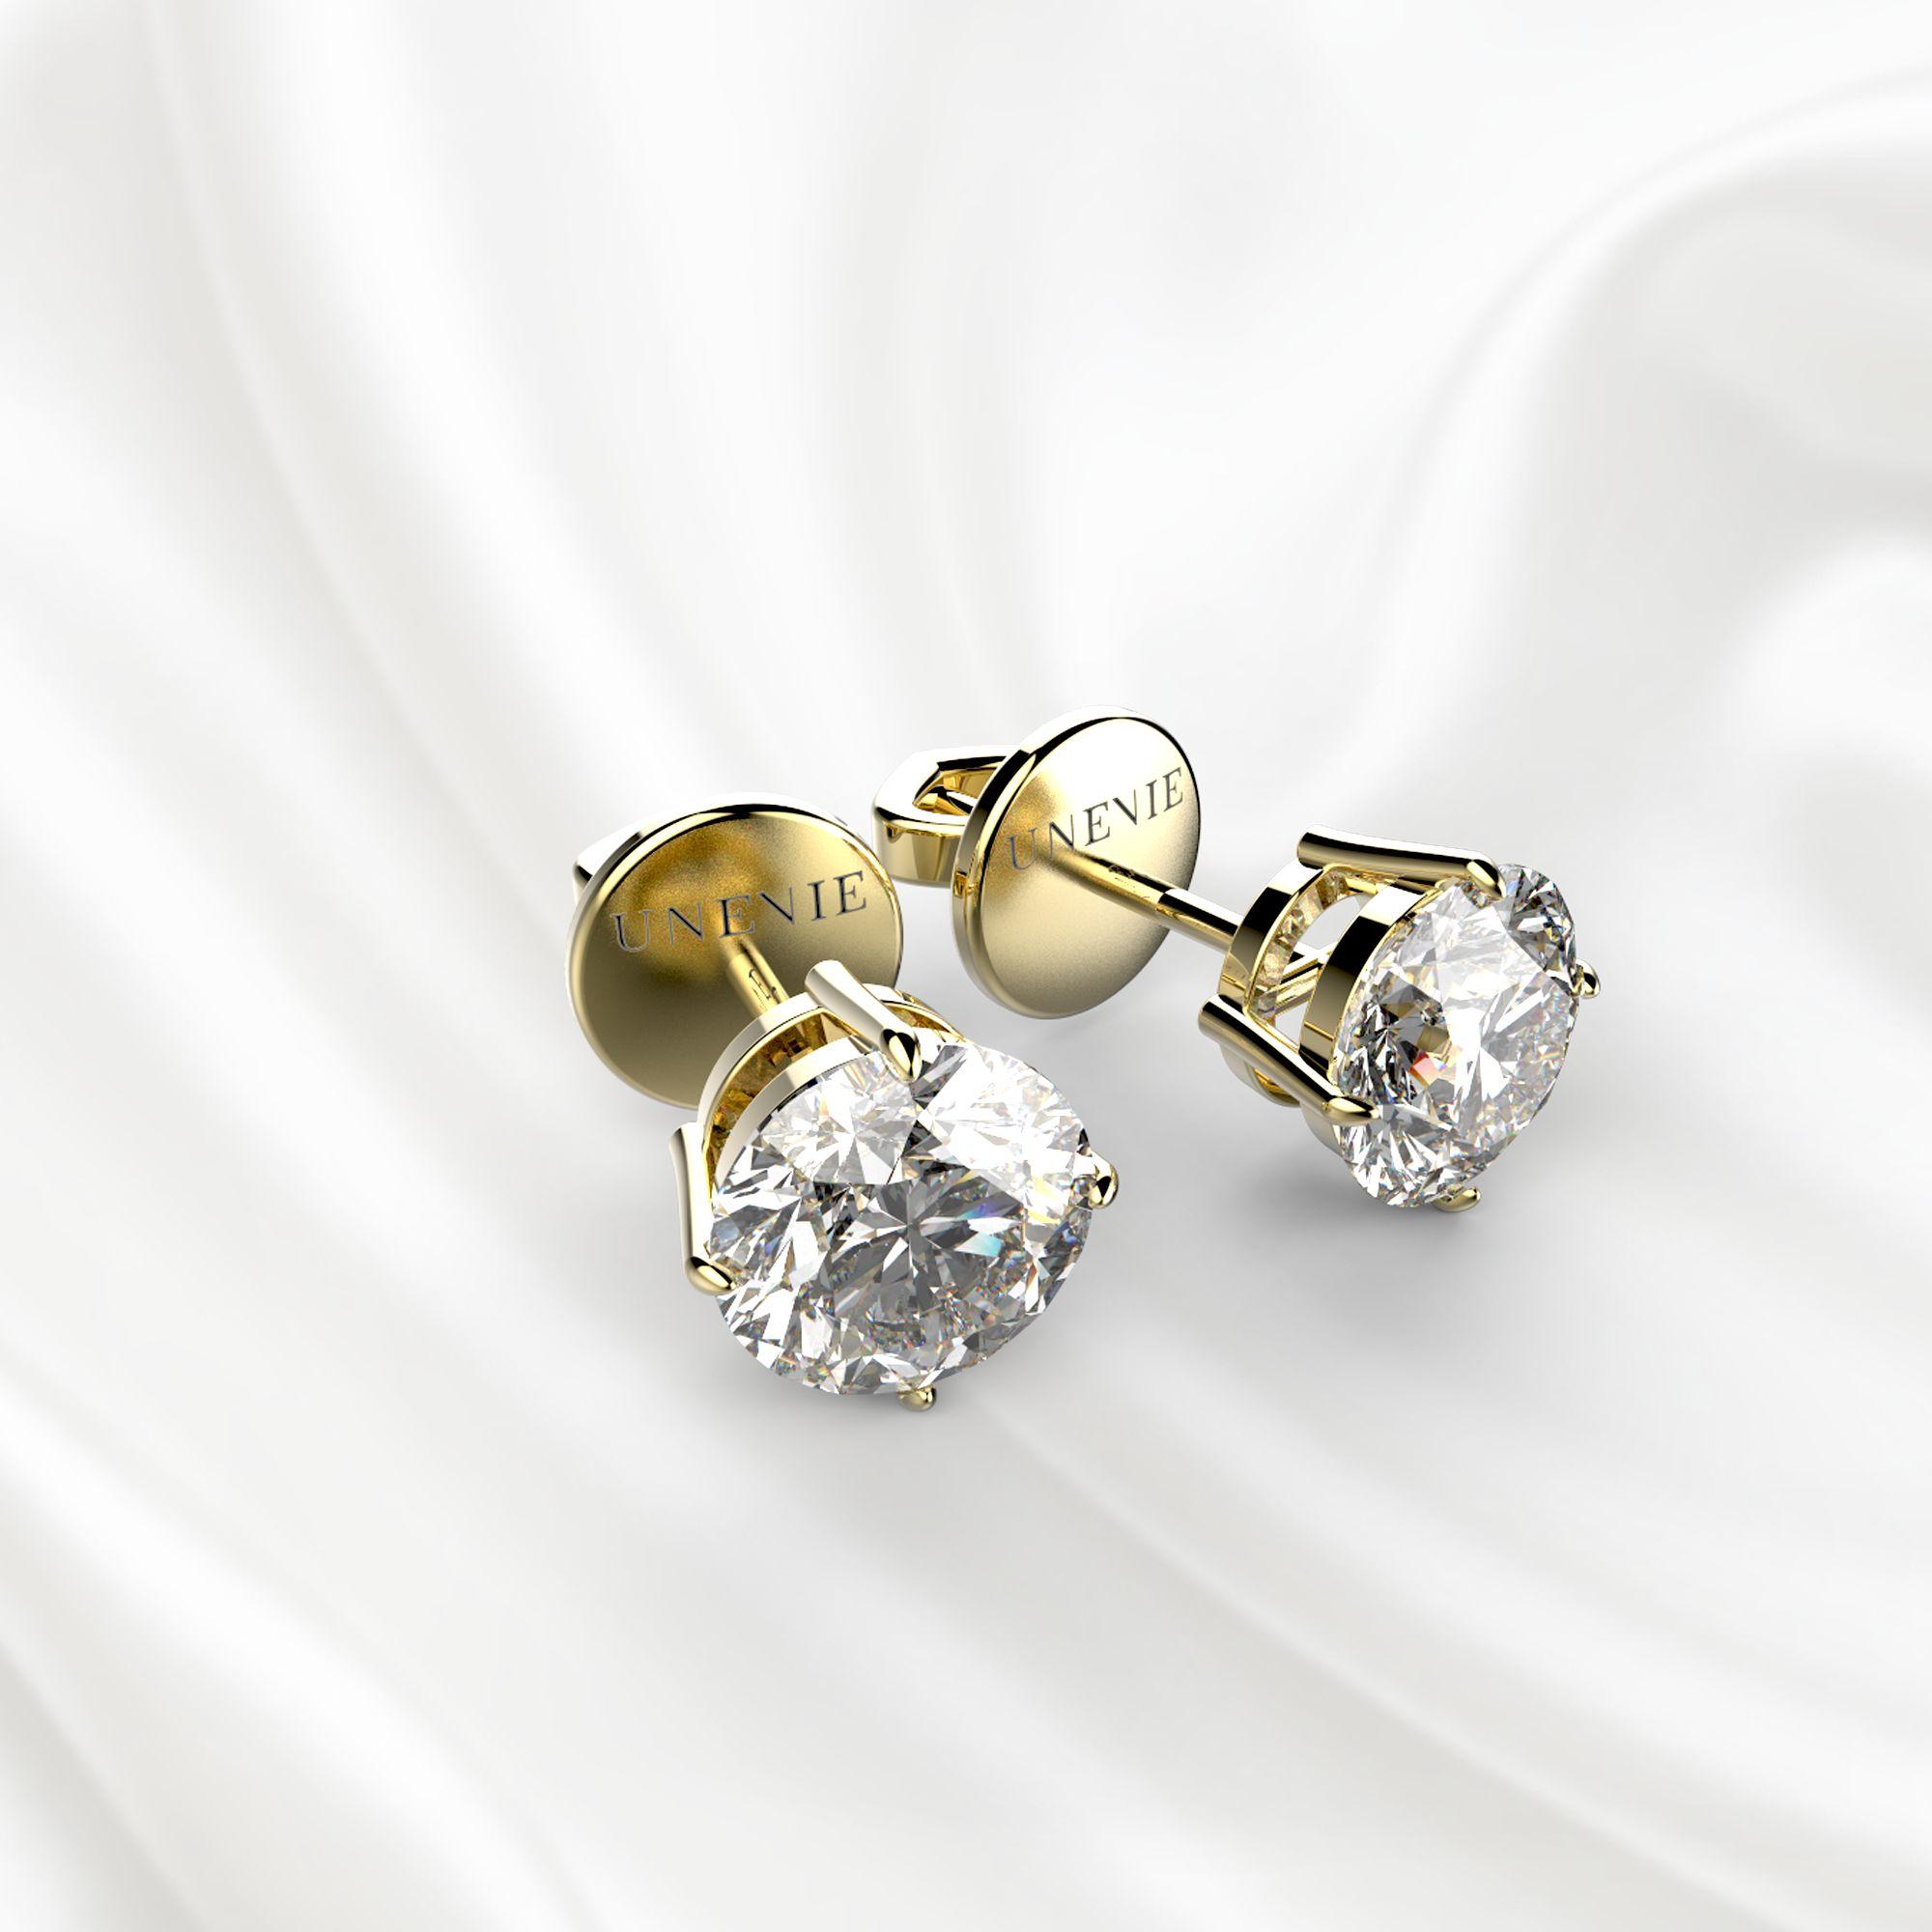 S3 Серьги из желтого золота с бриллиантами 0.8 карат